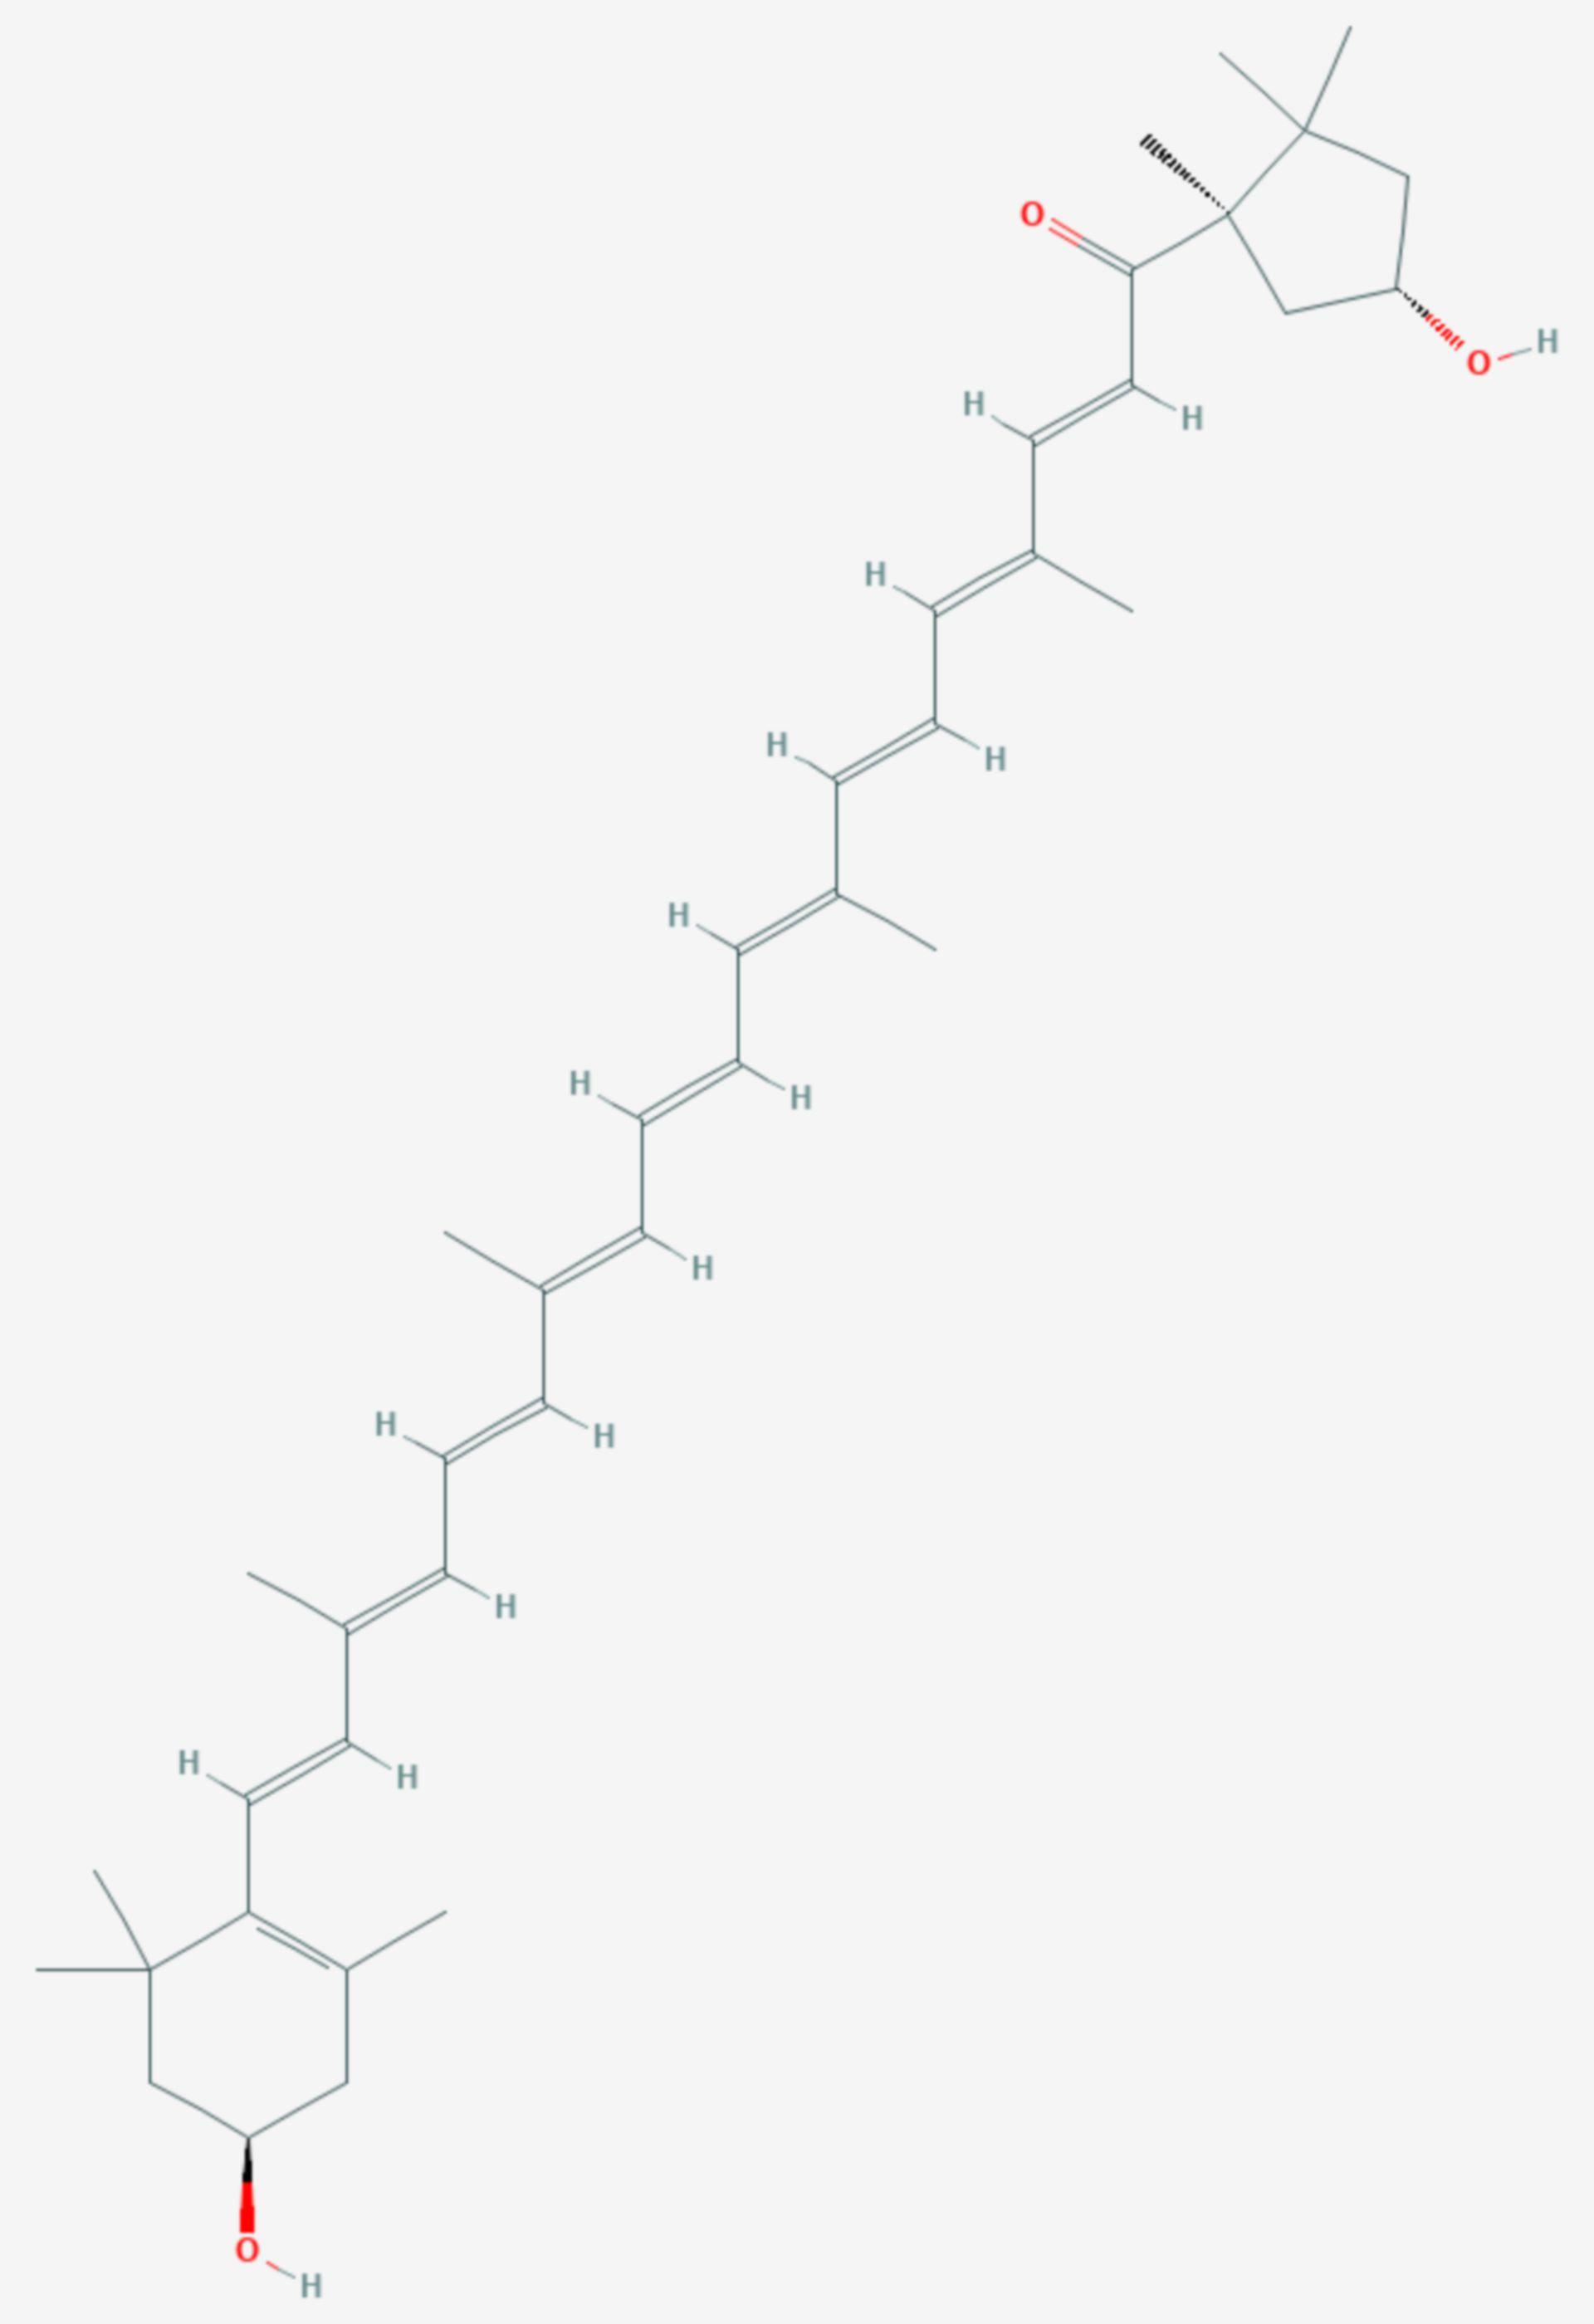 Capsanthin (Strukturformel)